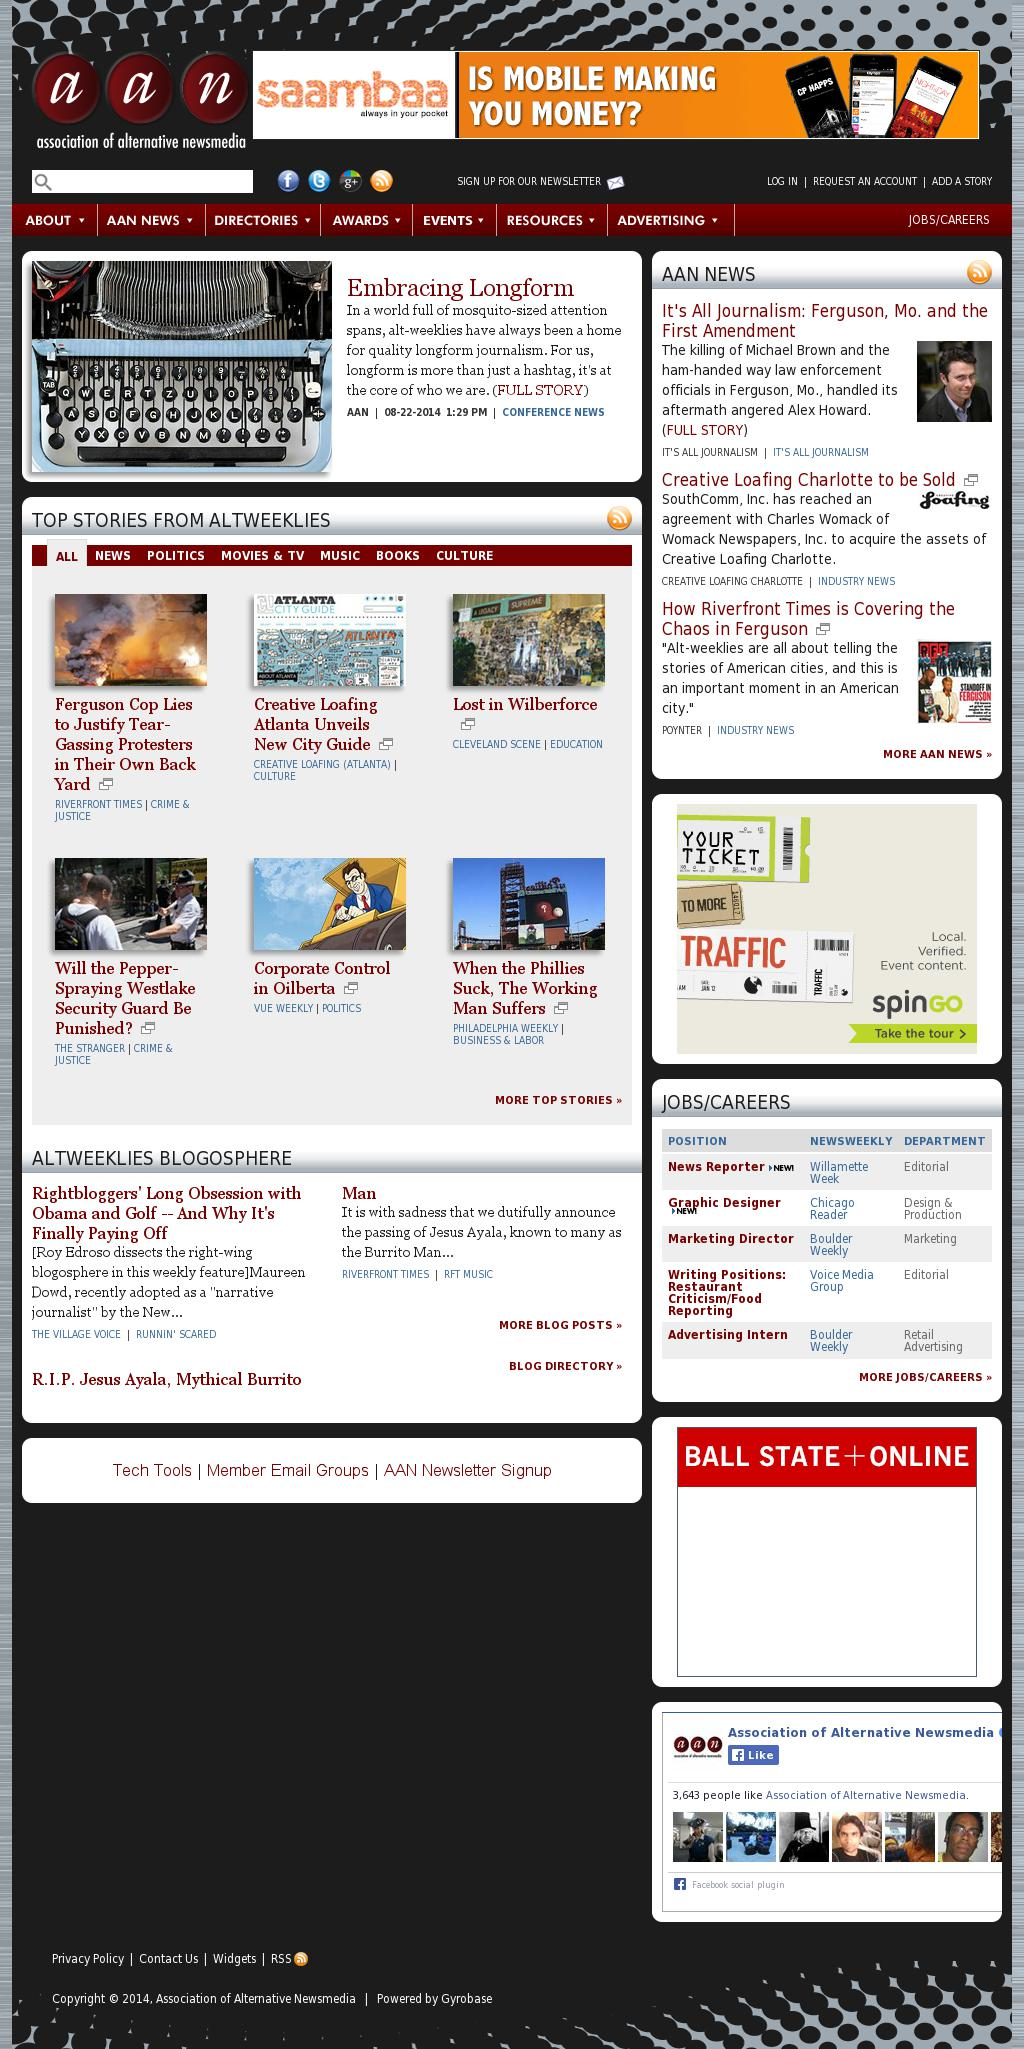 Association of Alternative Newsmedia at Monday Aug. 25, 2014, 10 a.m. UTC